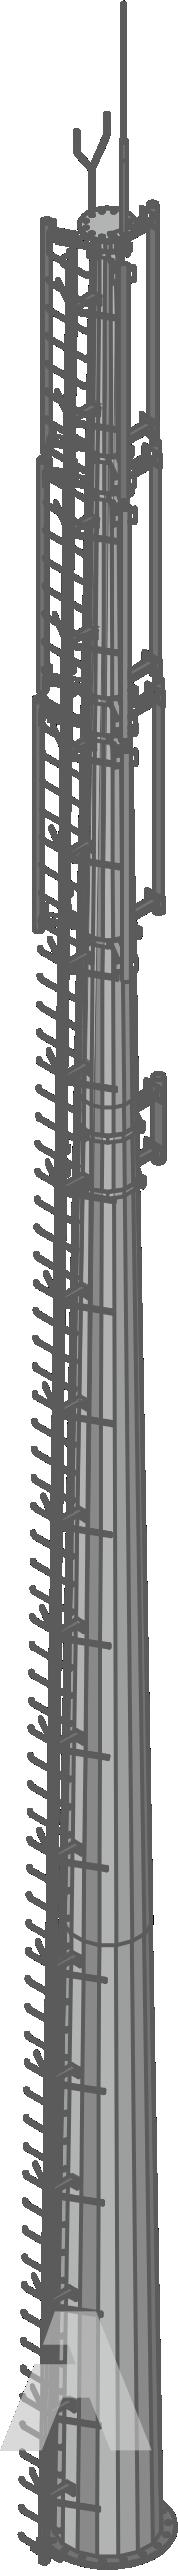 Опоры сотовой связи (РМГ)